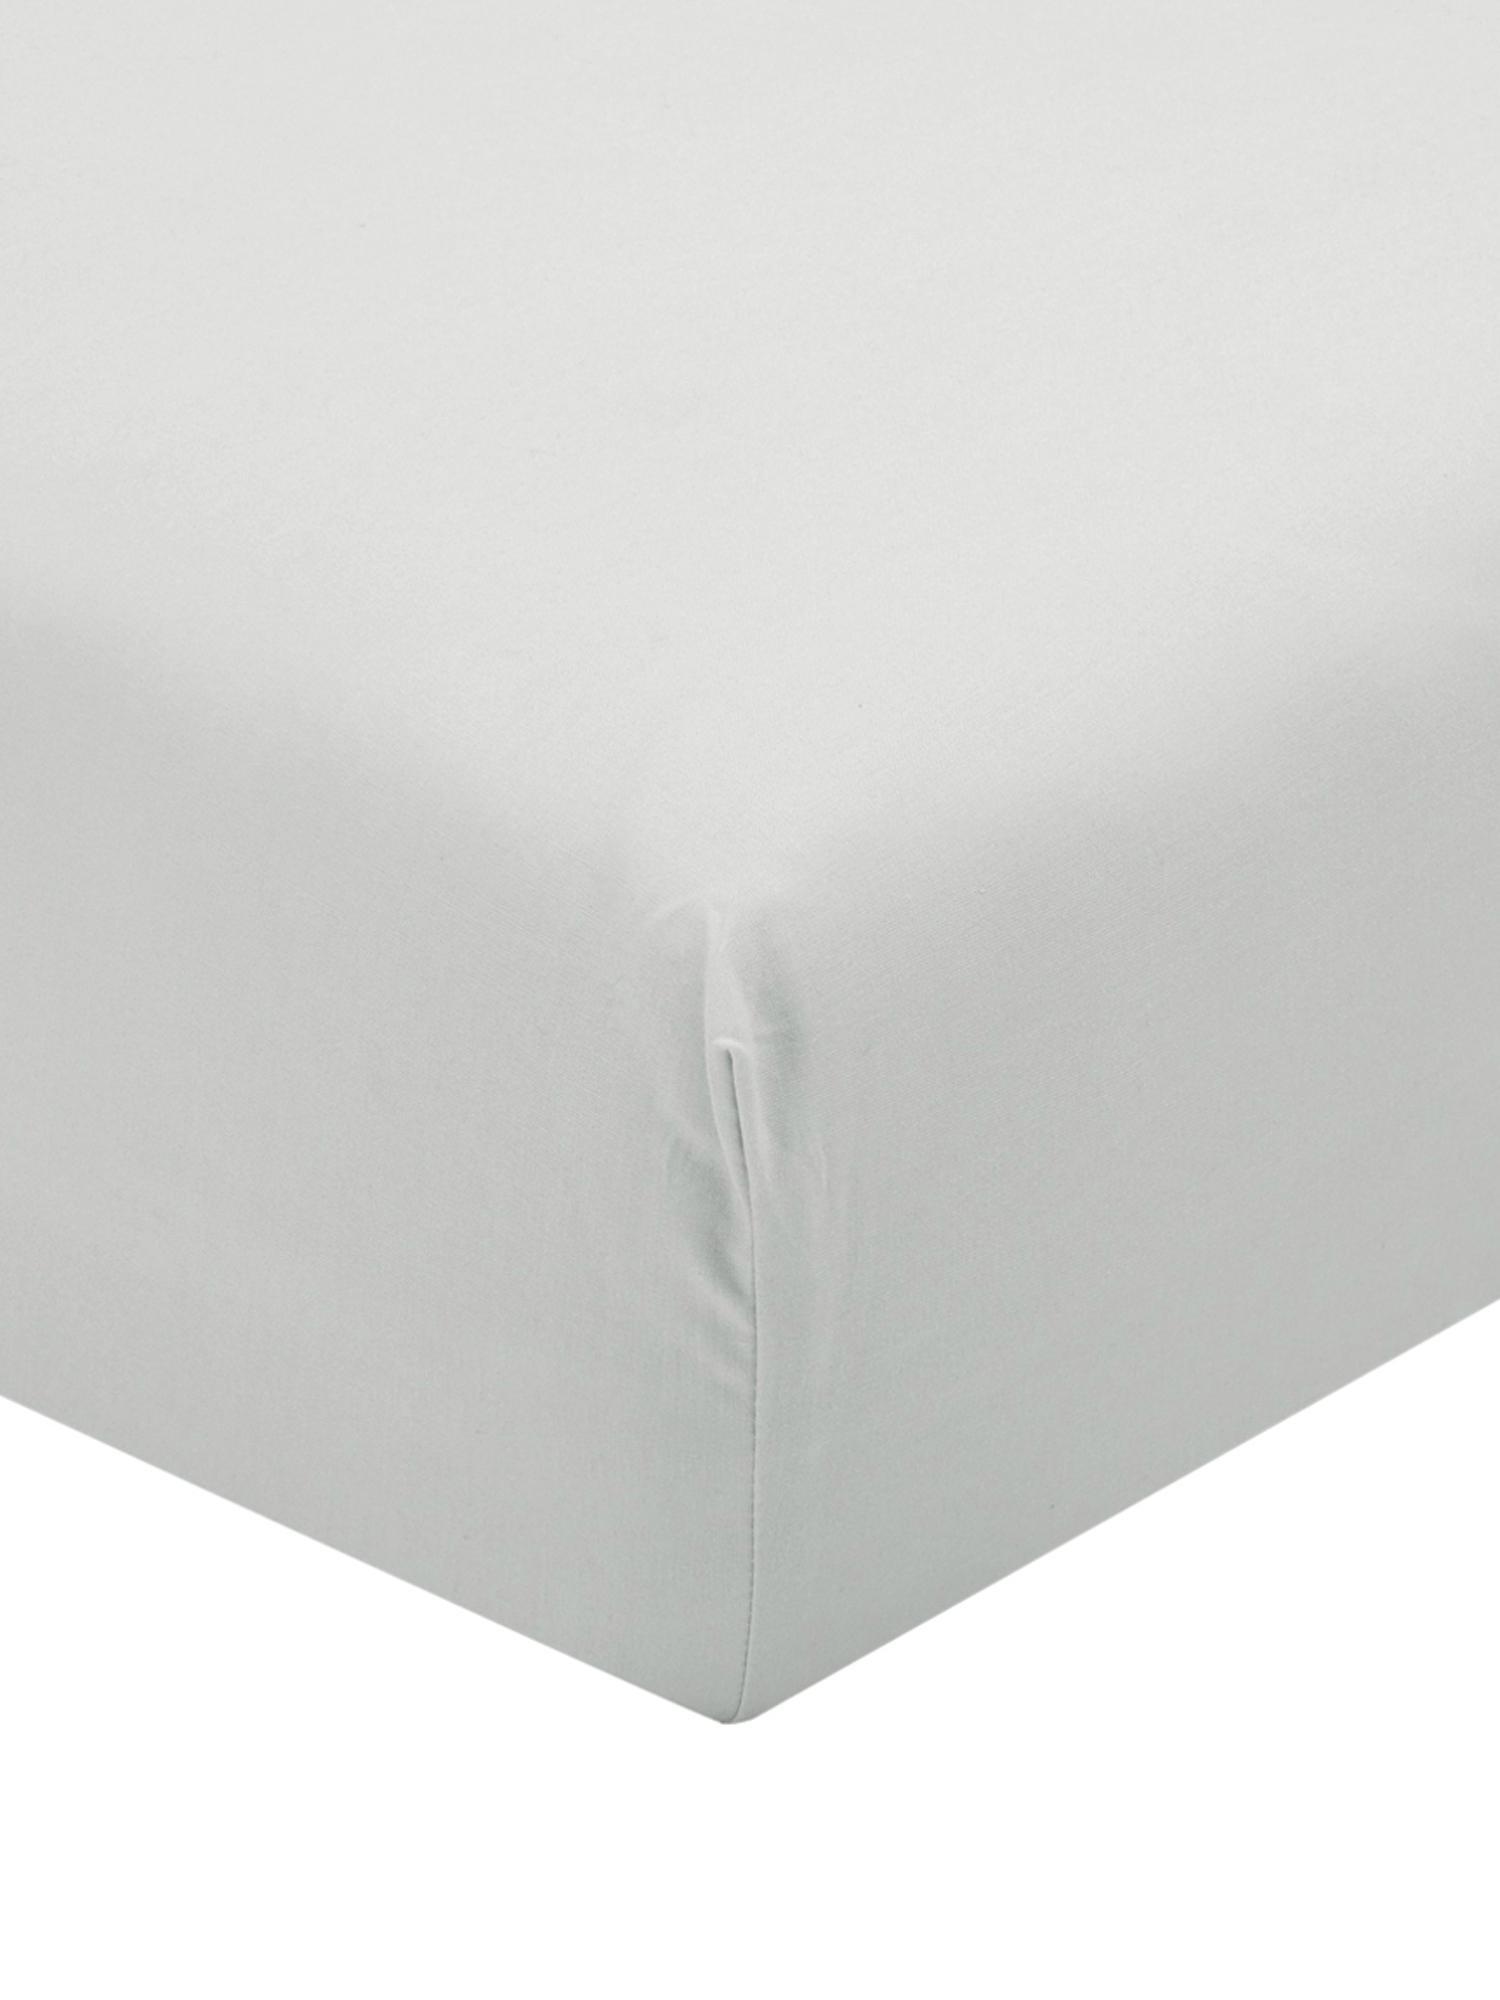 Sábana bajera de percal Elsie, Gris claro, Cama 90 cm (90 x 200 cm)